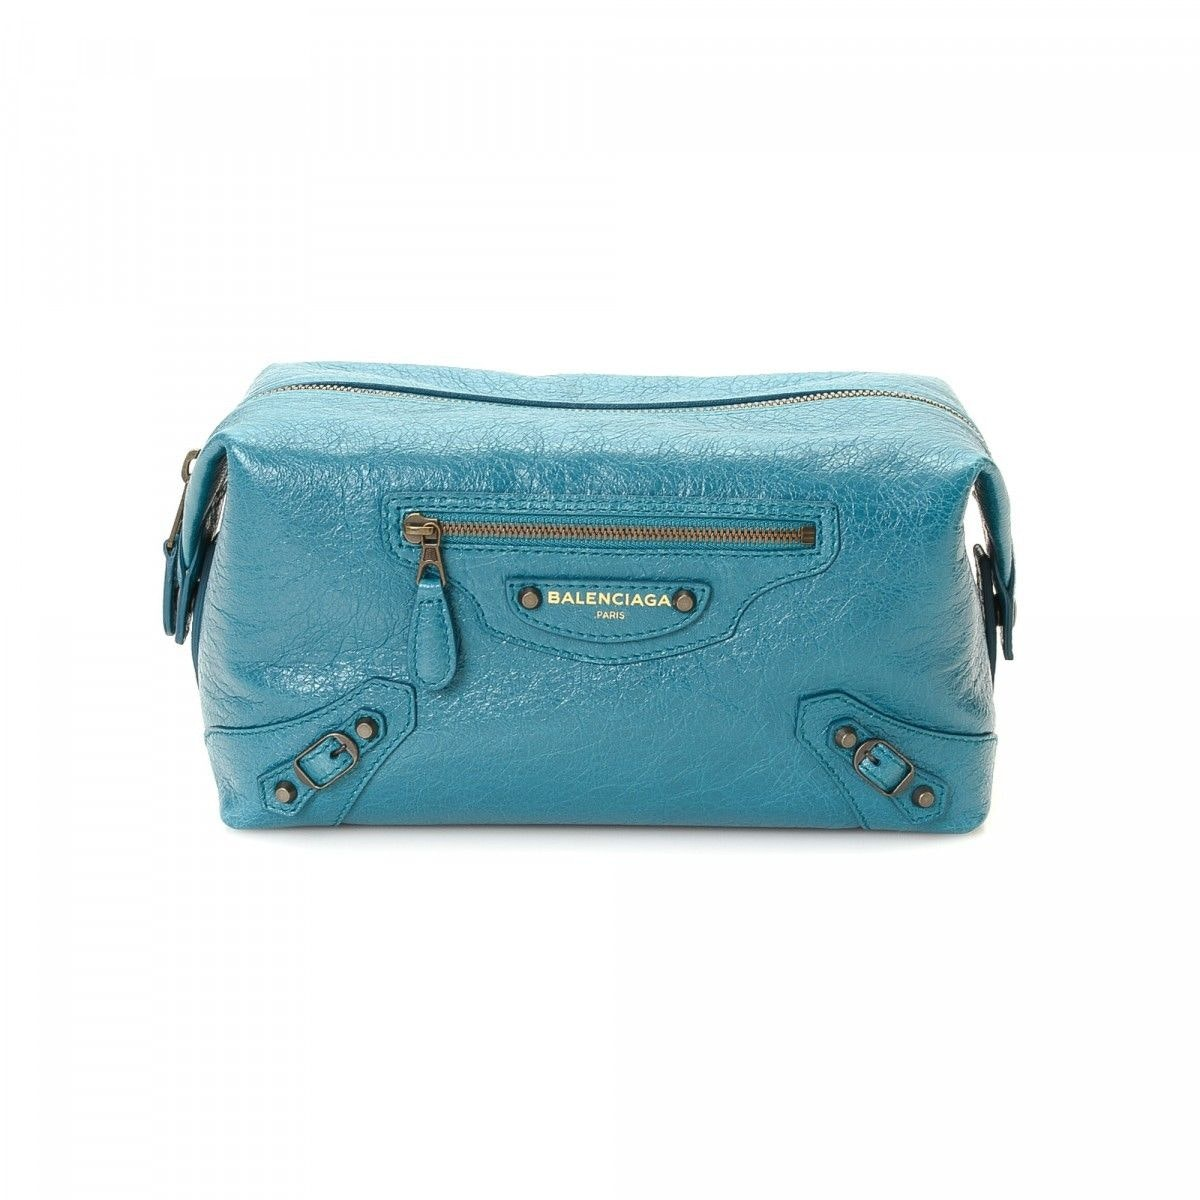 Balenciaga Trousse Vanity Case Blue